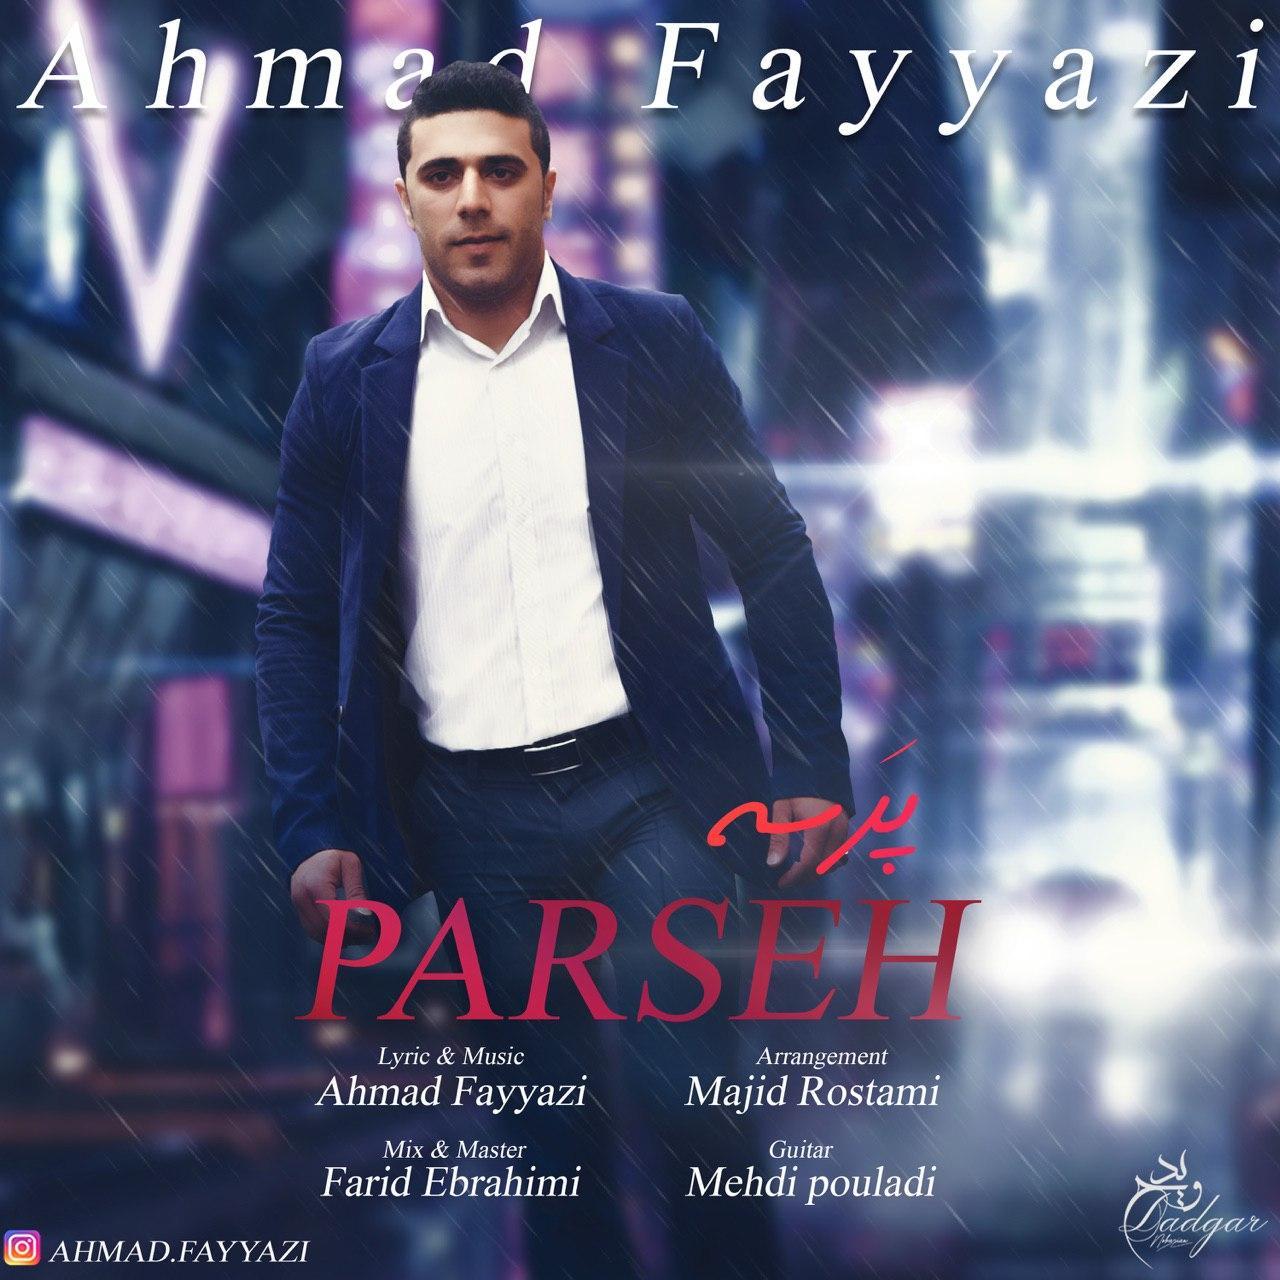 Ahmad Fayyazi – Parseh